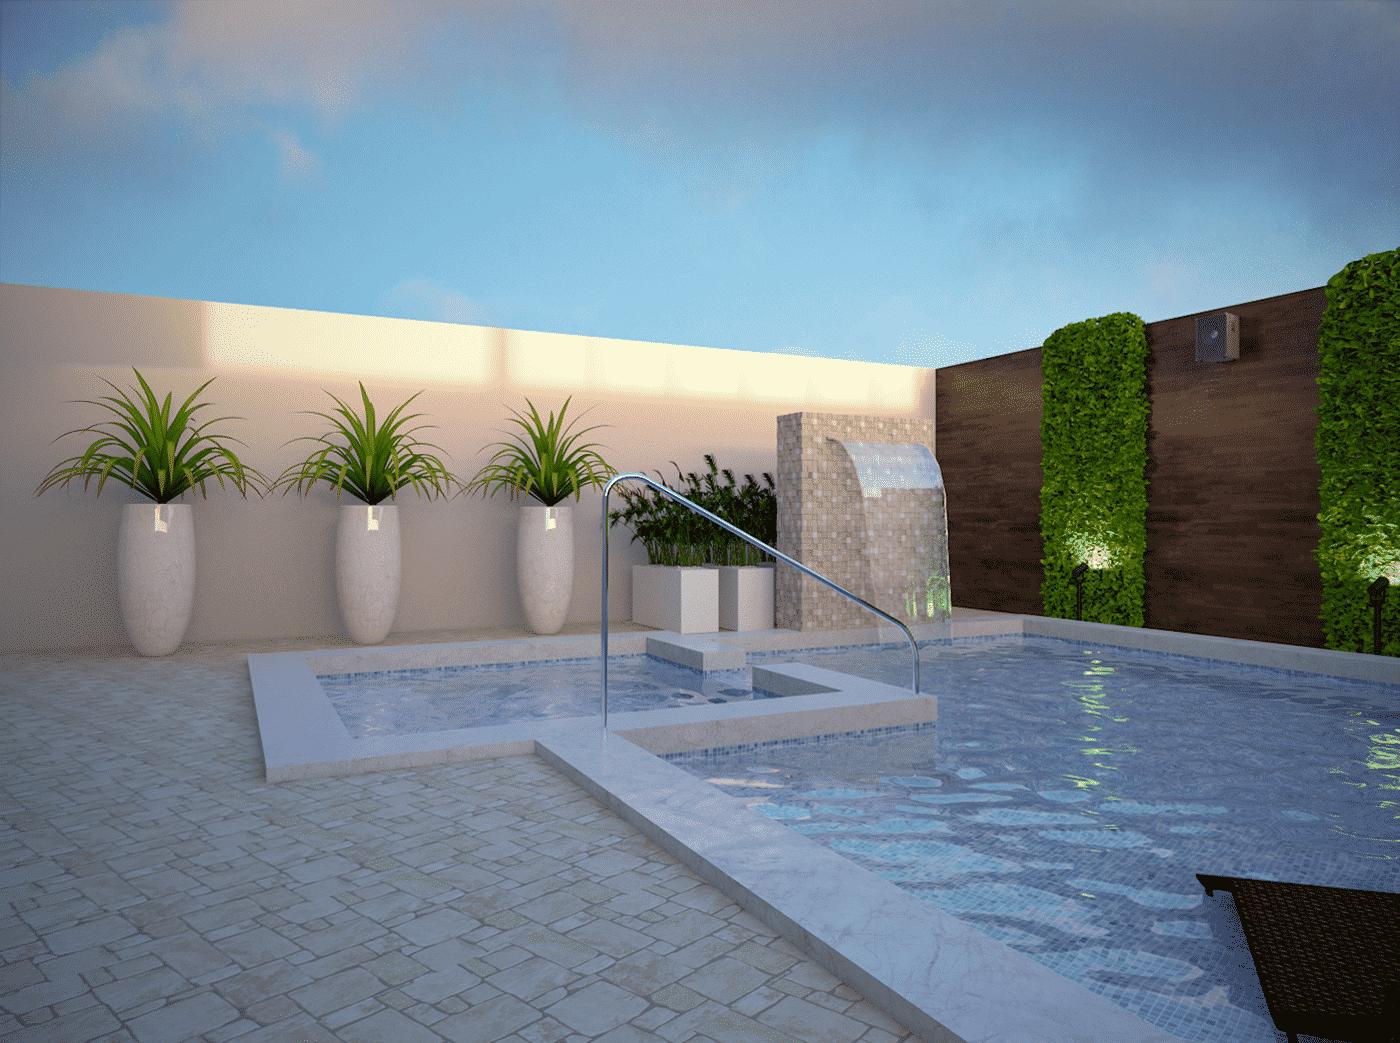 открытый бассейн на даче, фото 5